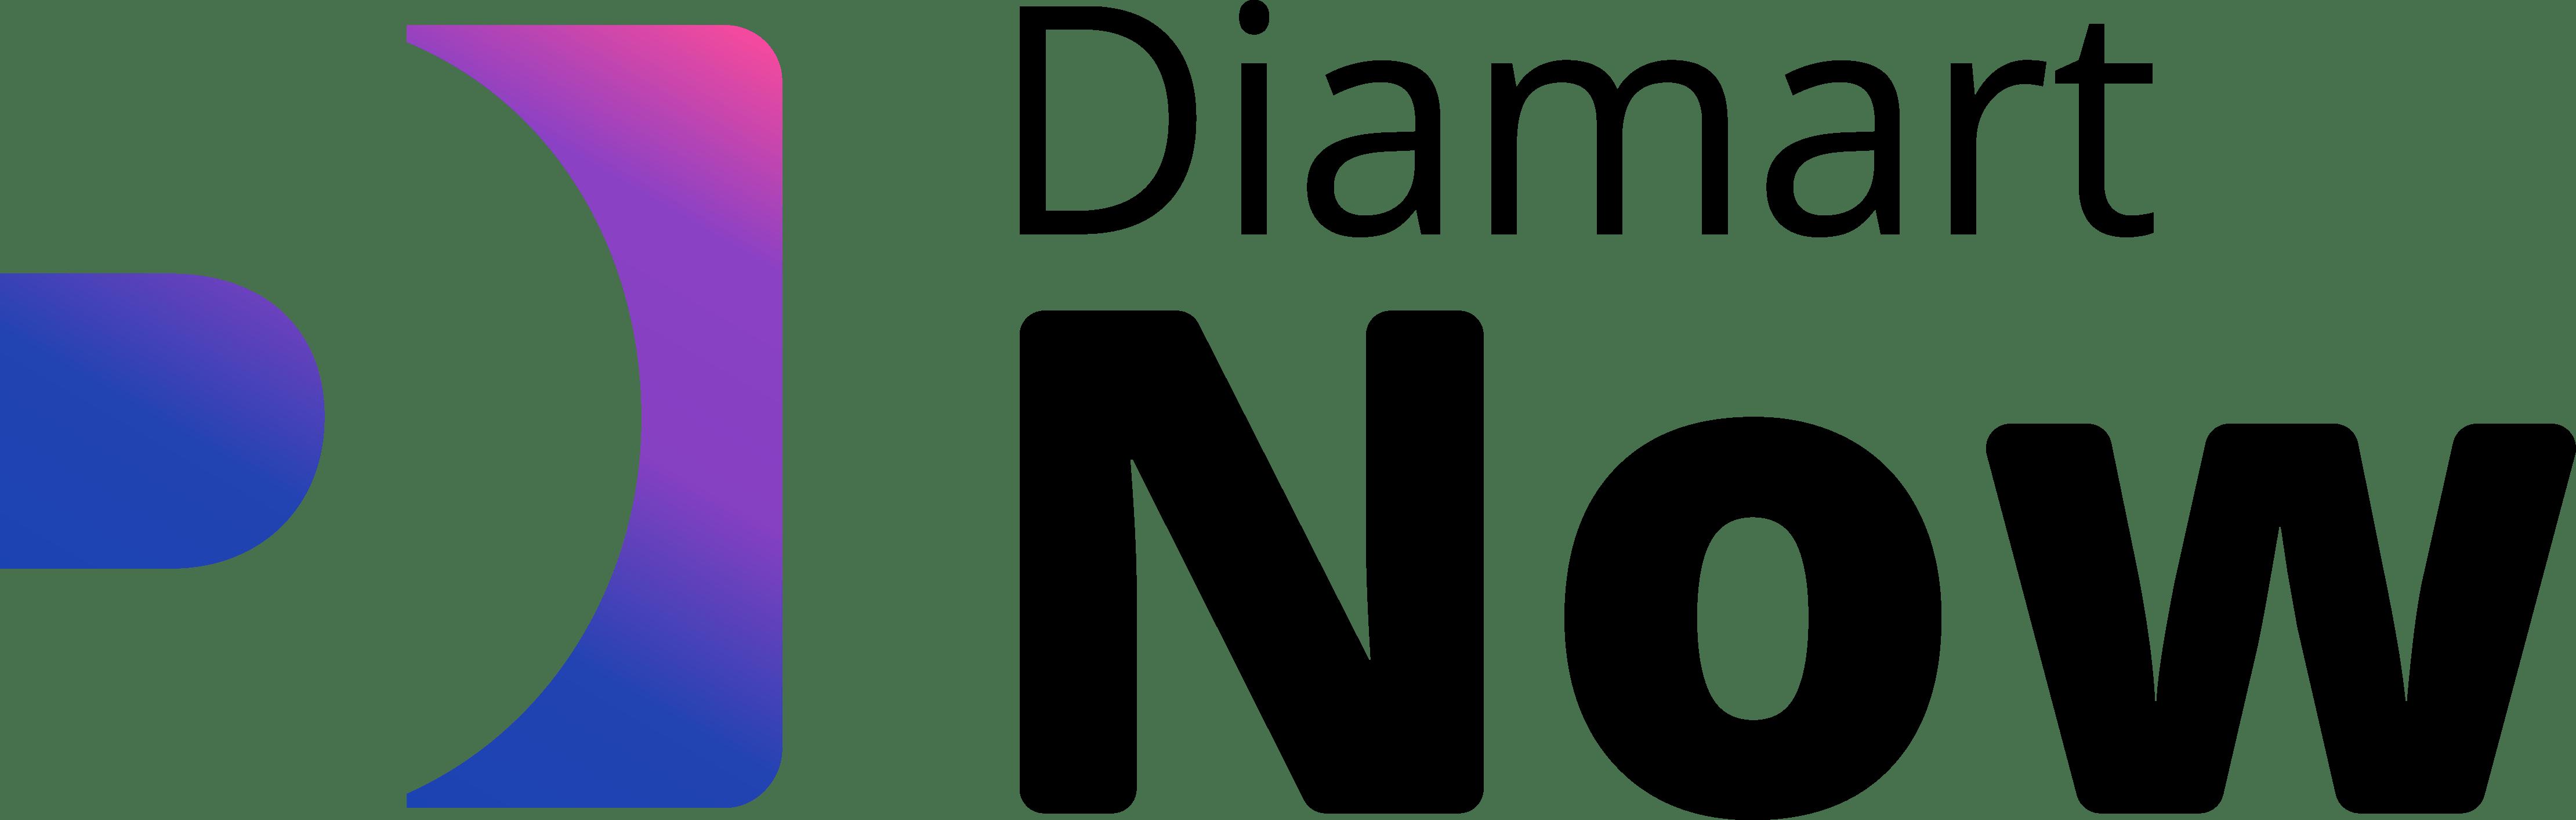 Diamart Now logo